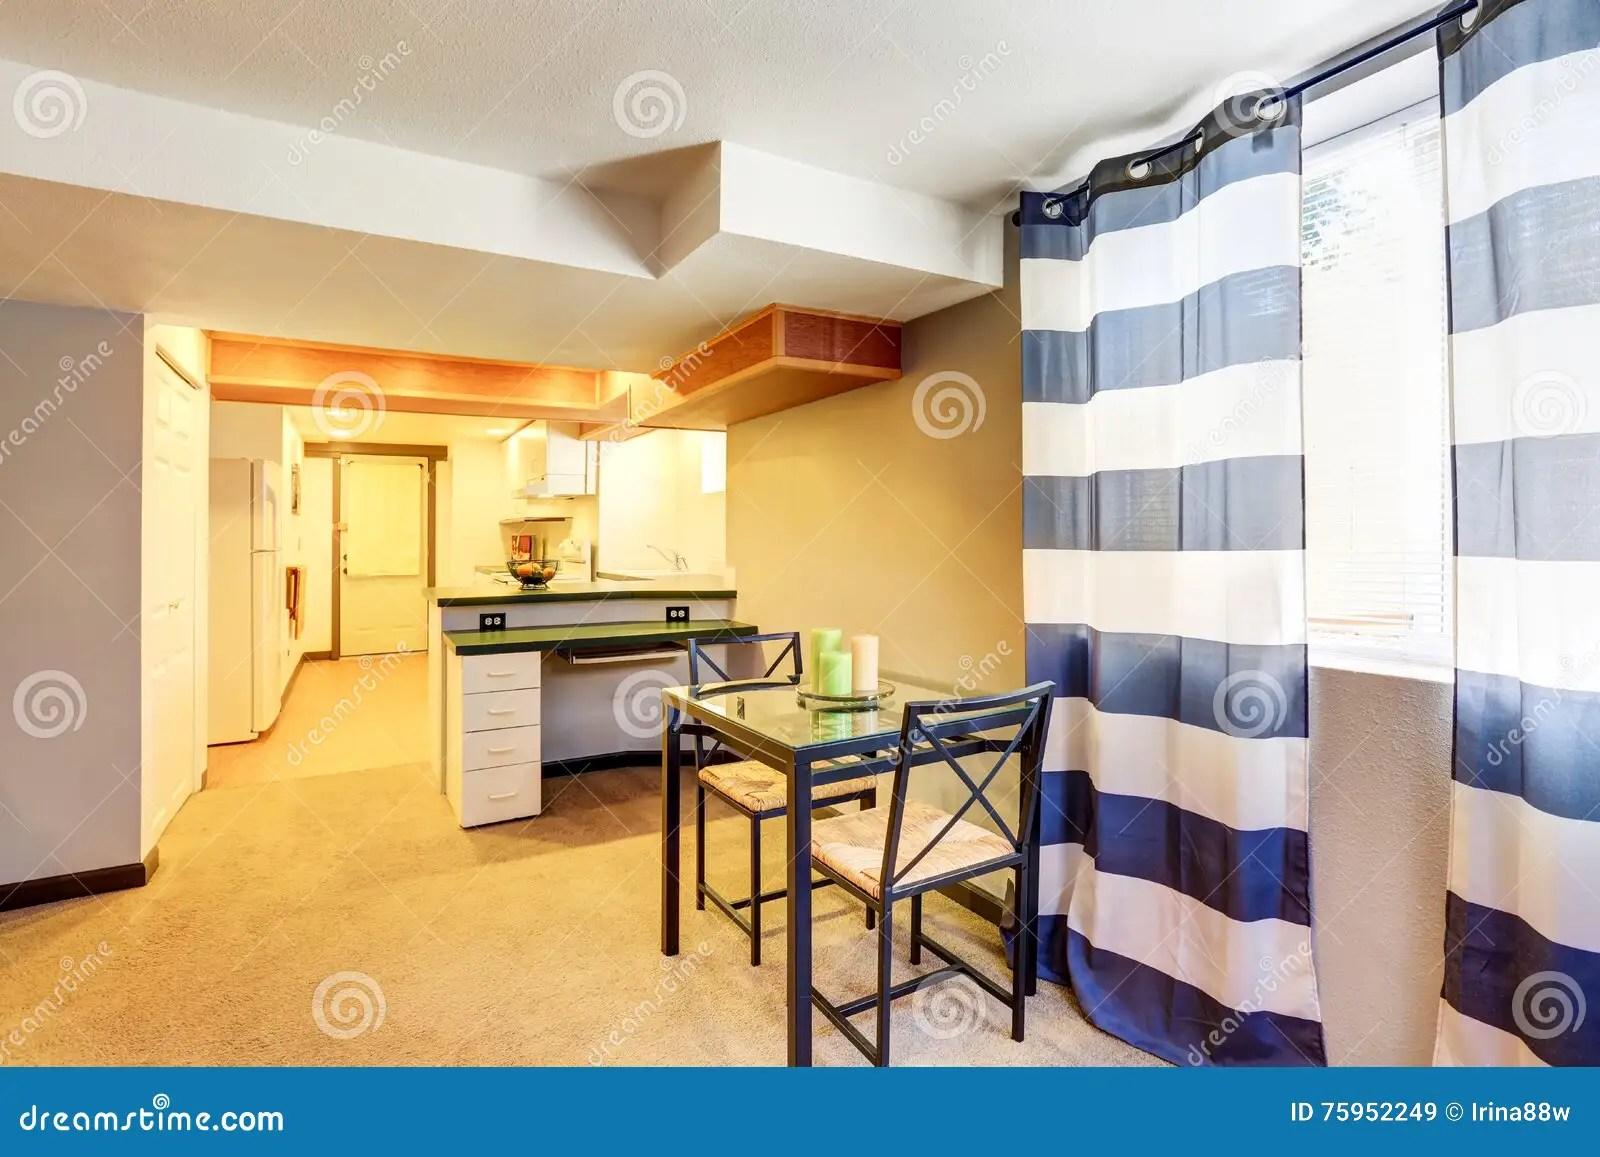 kitchen table nook grills 餐桌集合看法厨房在背景中库存图片 图片包括有角落 庄园 自由 摄影 餐桌看法与两把椅子的厨房在背景中西北 美国